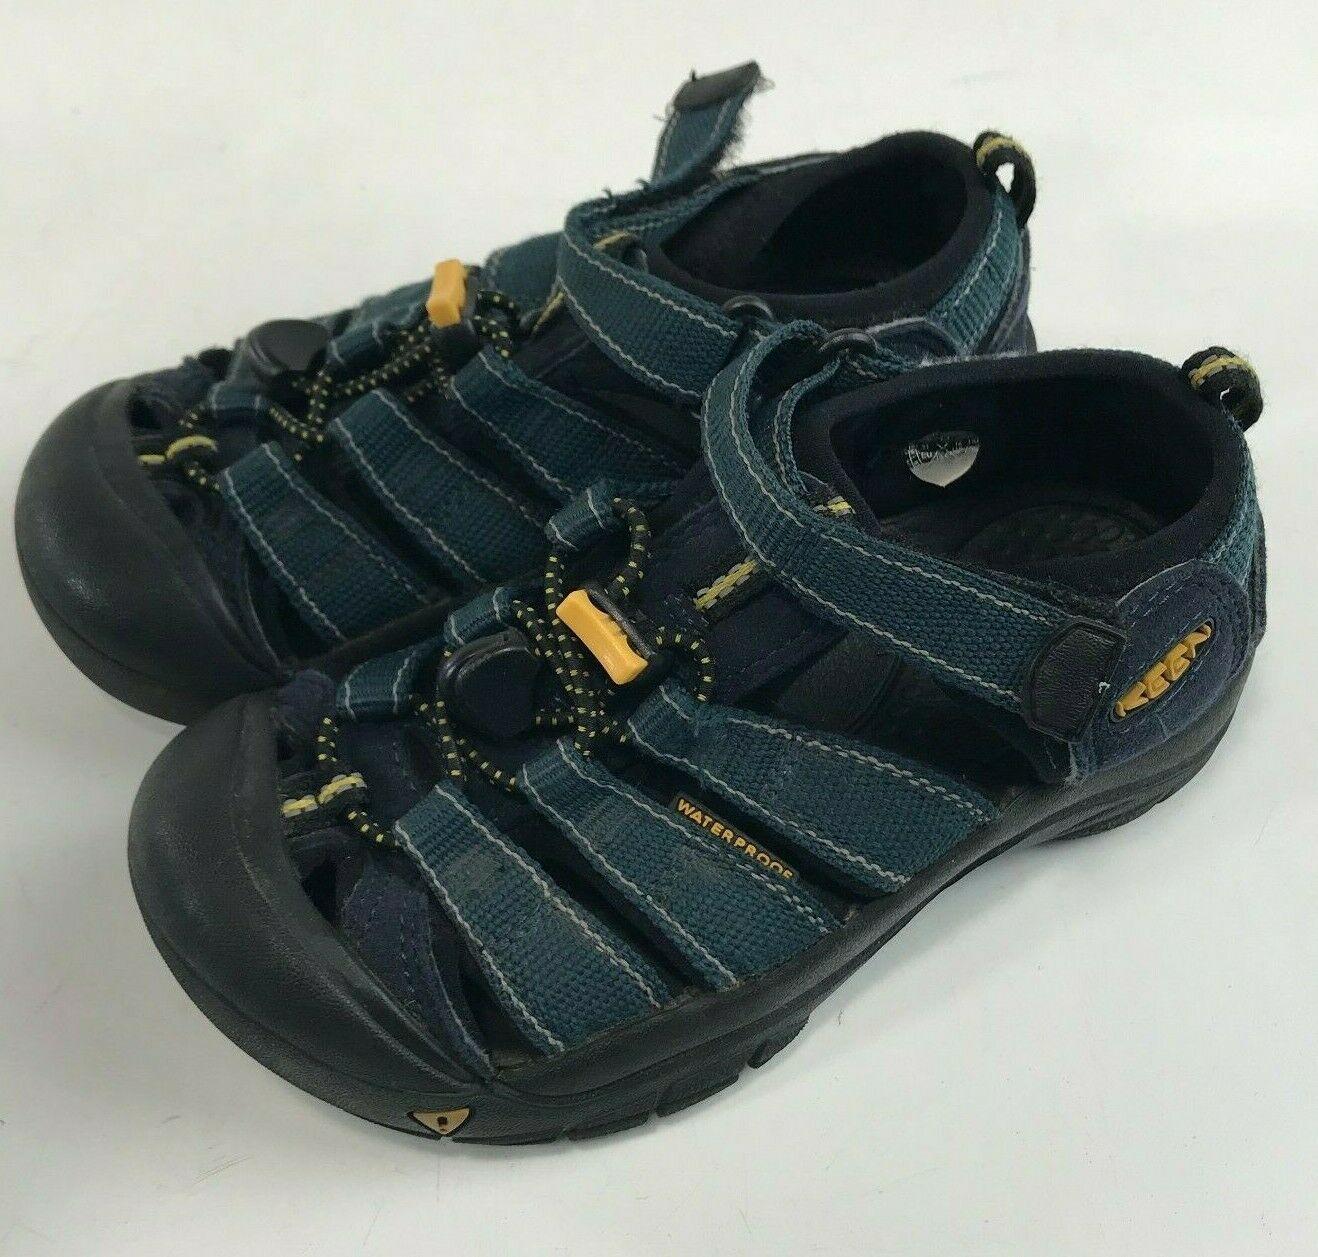 KEEN Newport Waterproof Sports Sandals Shoes Size 13 Boy Toddler